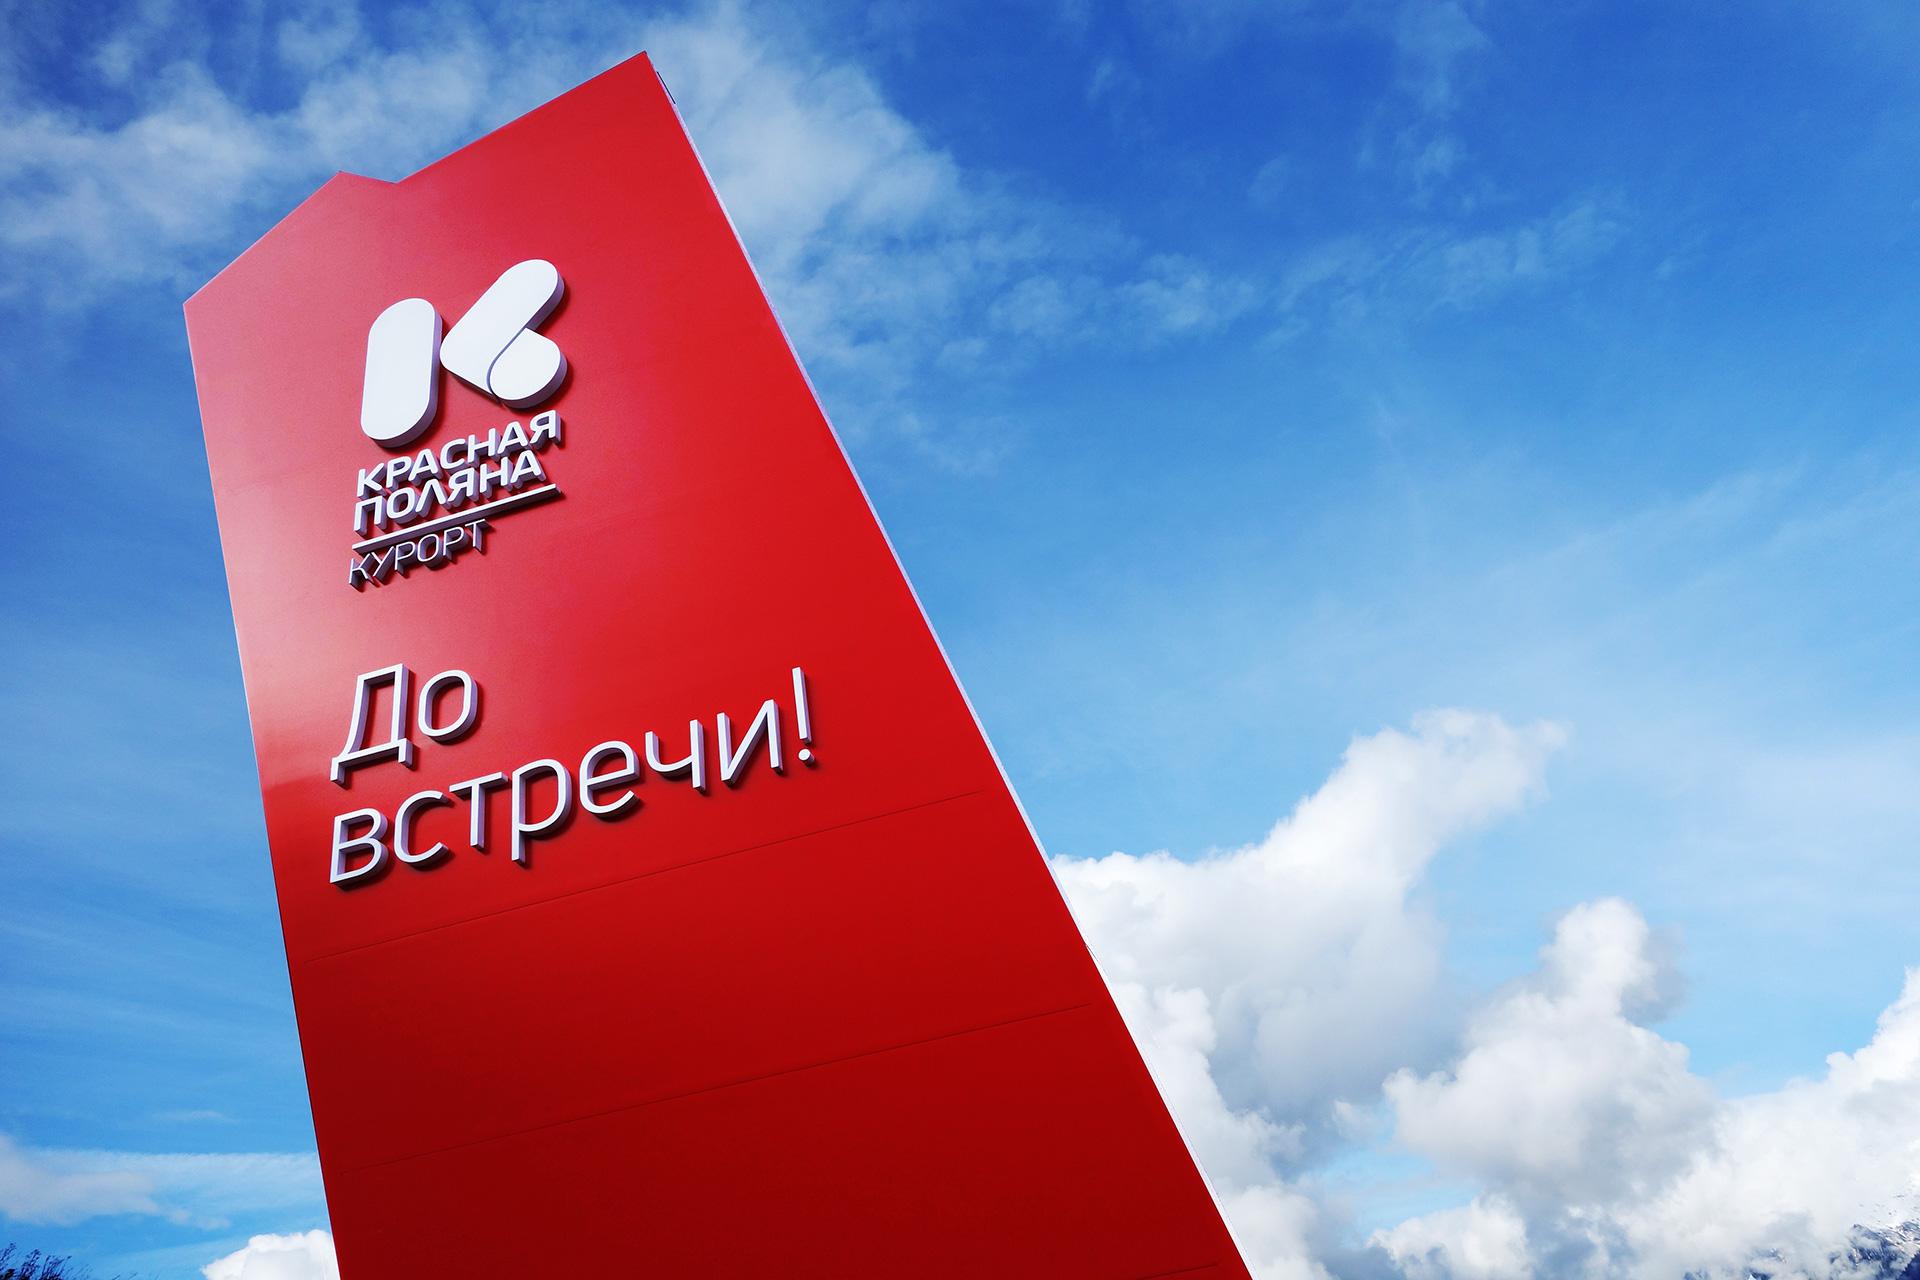 Асгард Брендинг, Красная Поляна курорт, стела, Red stele, средовой объект, объекты навигации